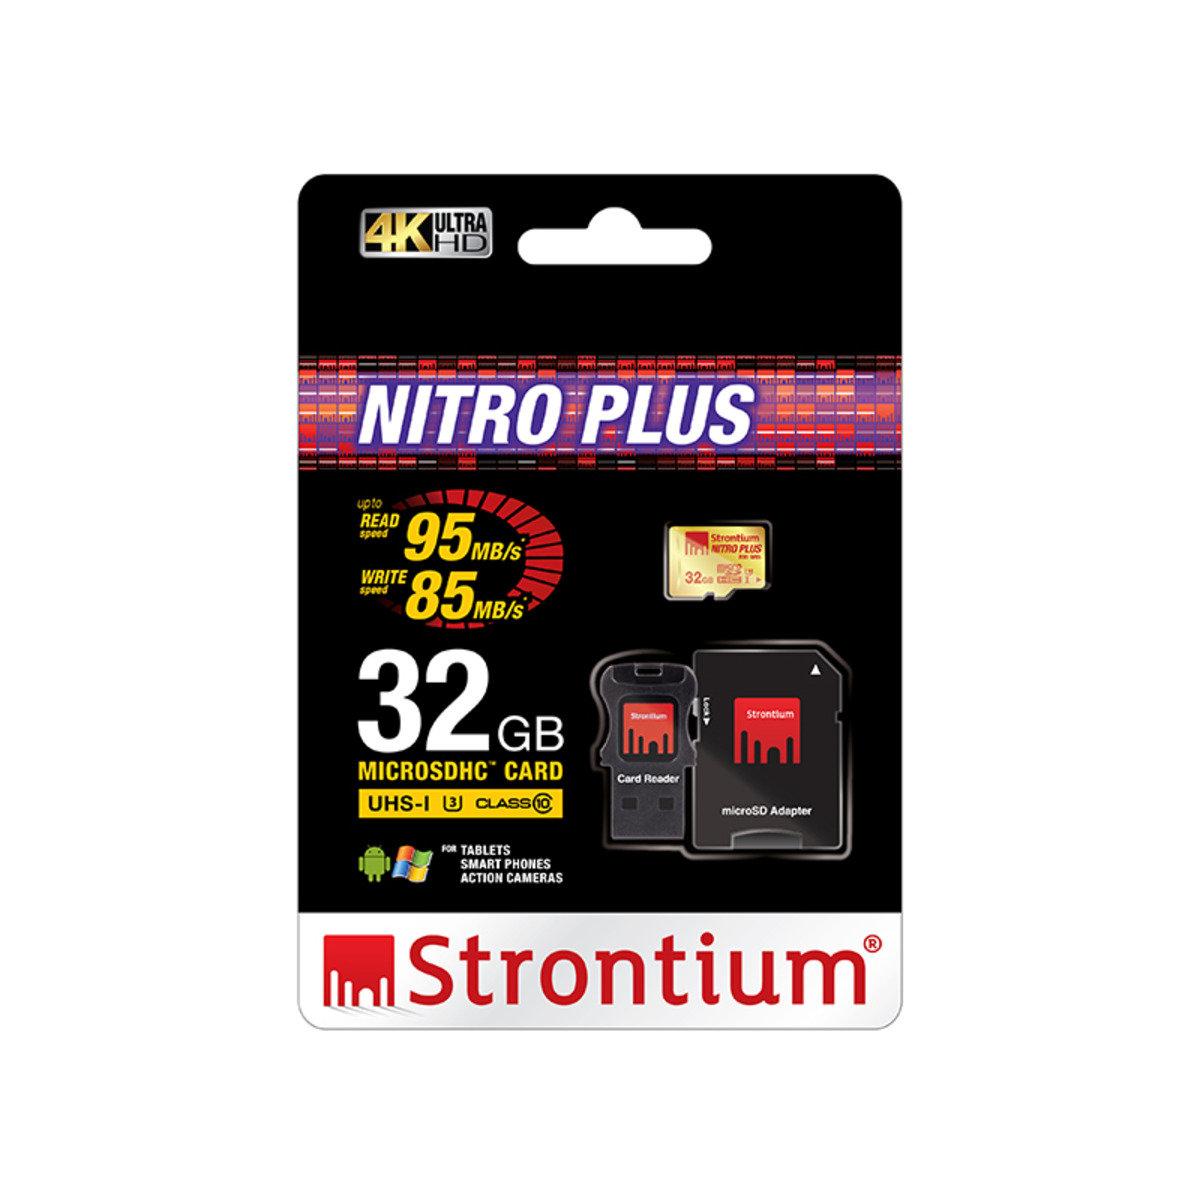 NITRO PLUS 32GB UHS-1 (U3) Class 10 micro SD SDHC 超高速4K專用記憶卡